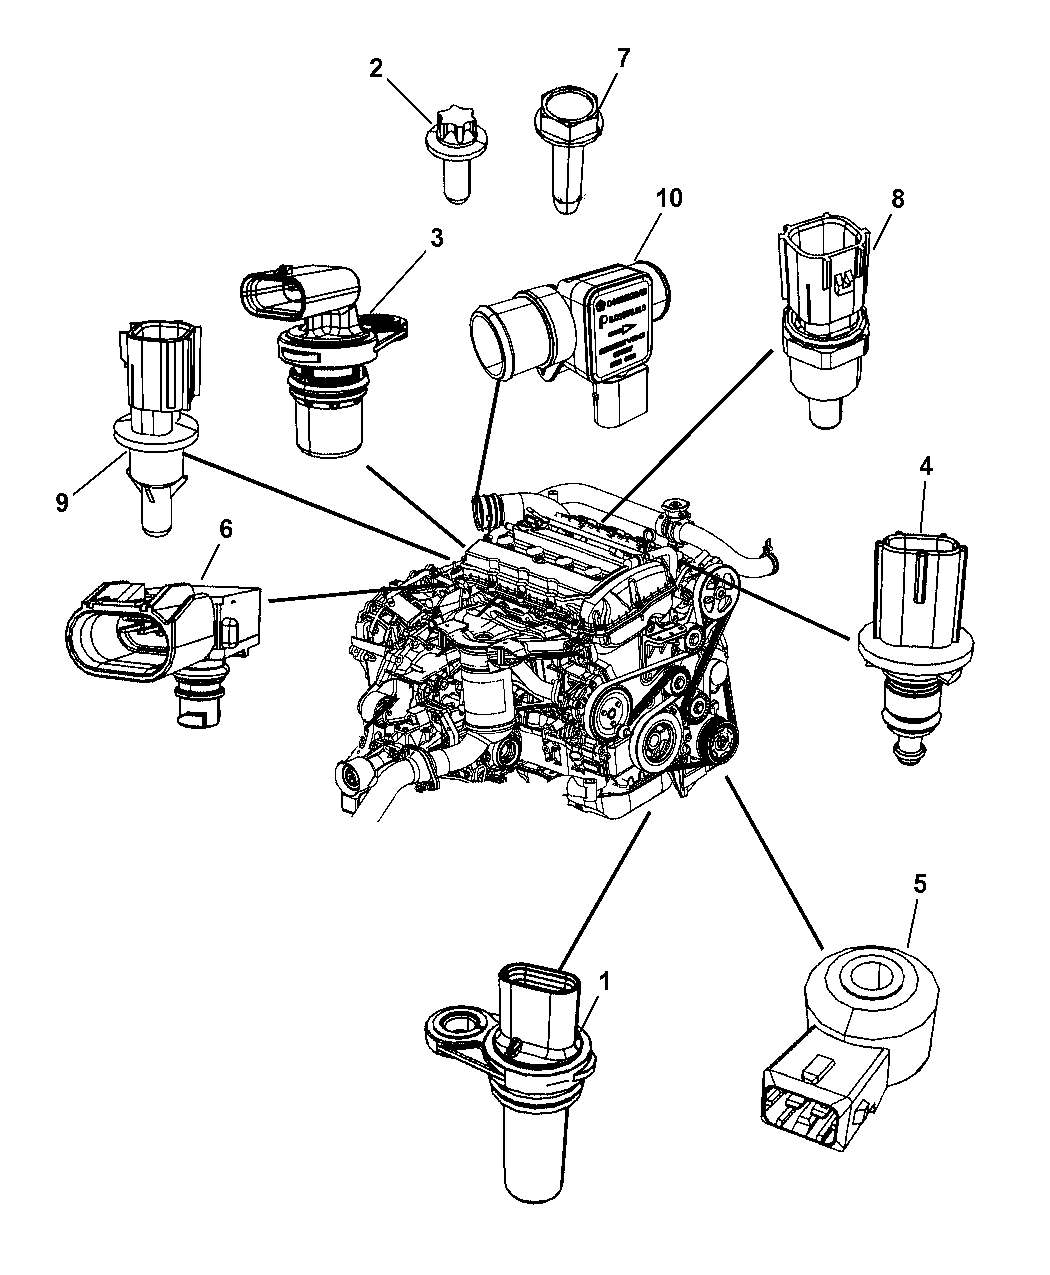 2009 Dodge Journey Sensors - Engine - Thumbnail 1